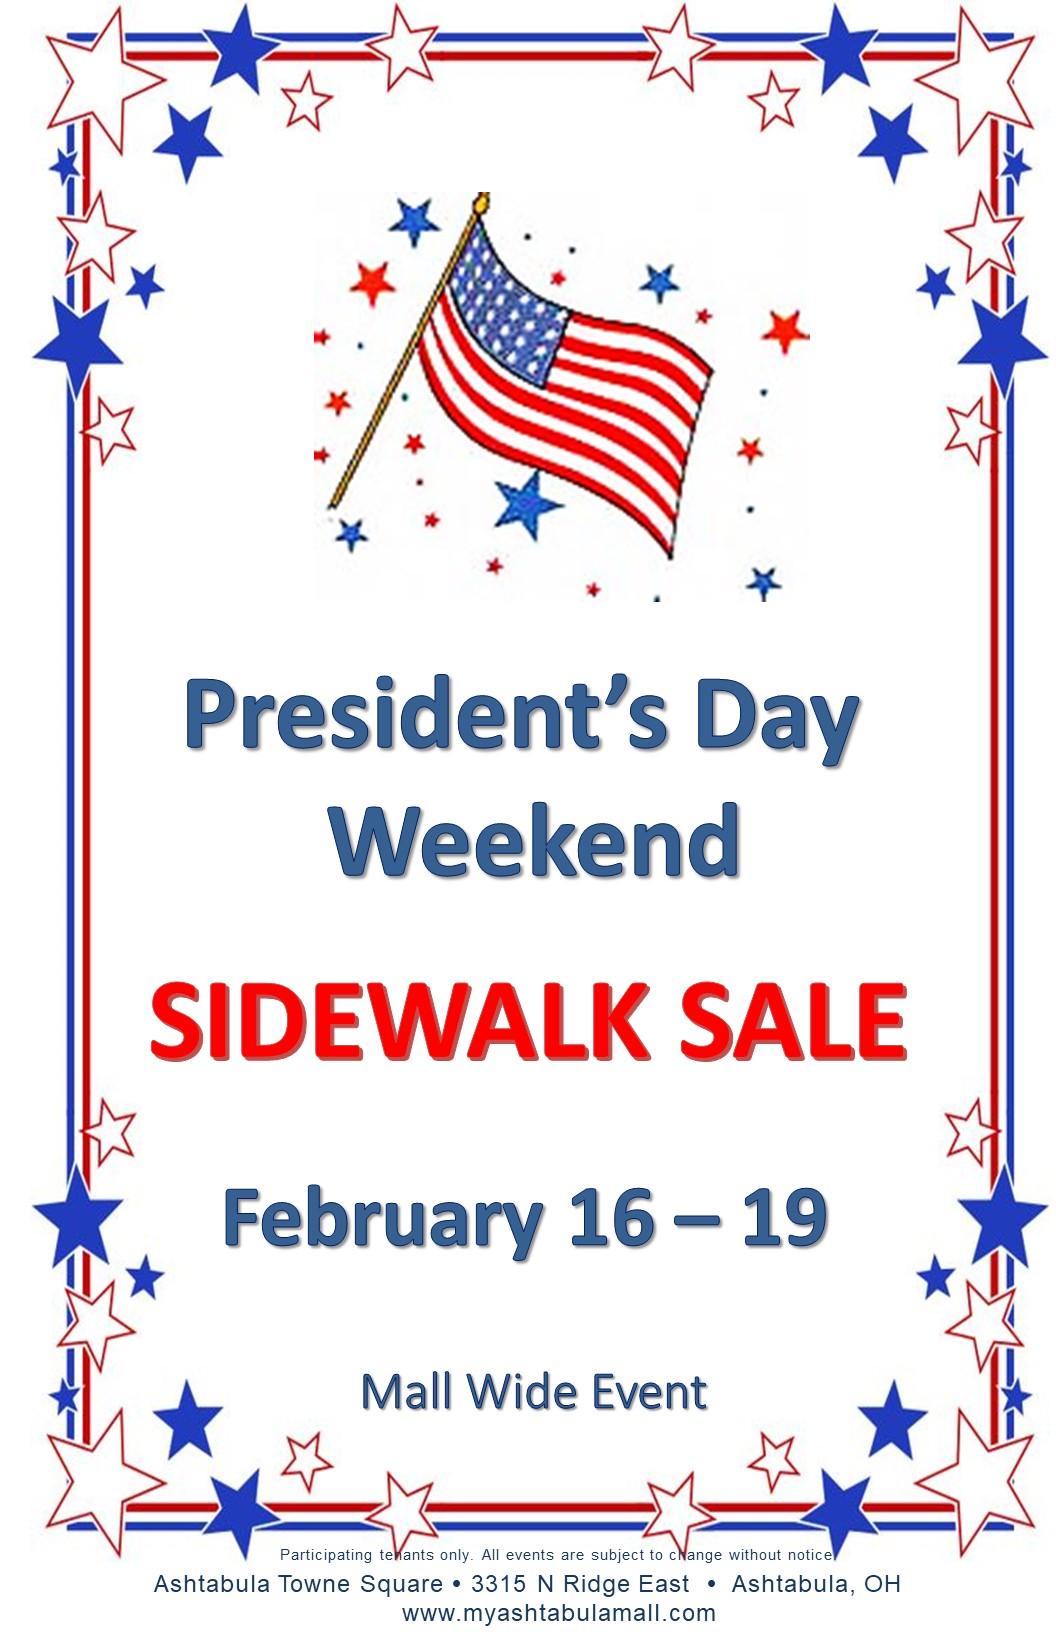 President's Day sidewalk Sale 2018 JPeg.jpg